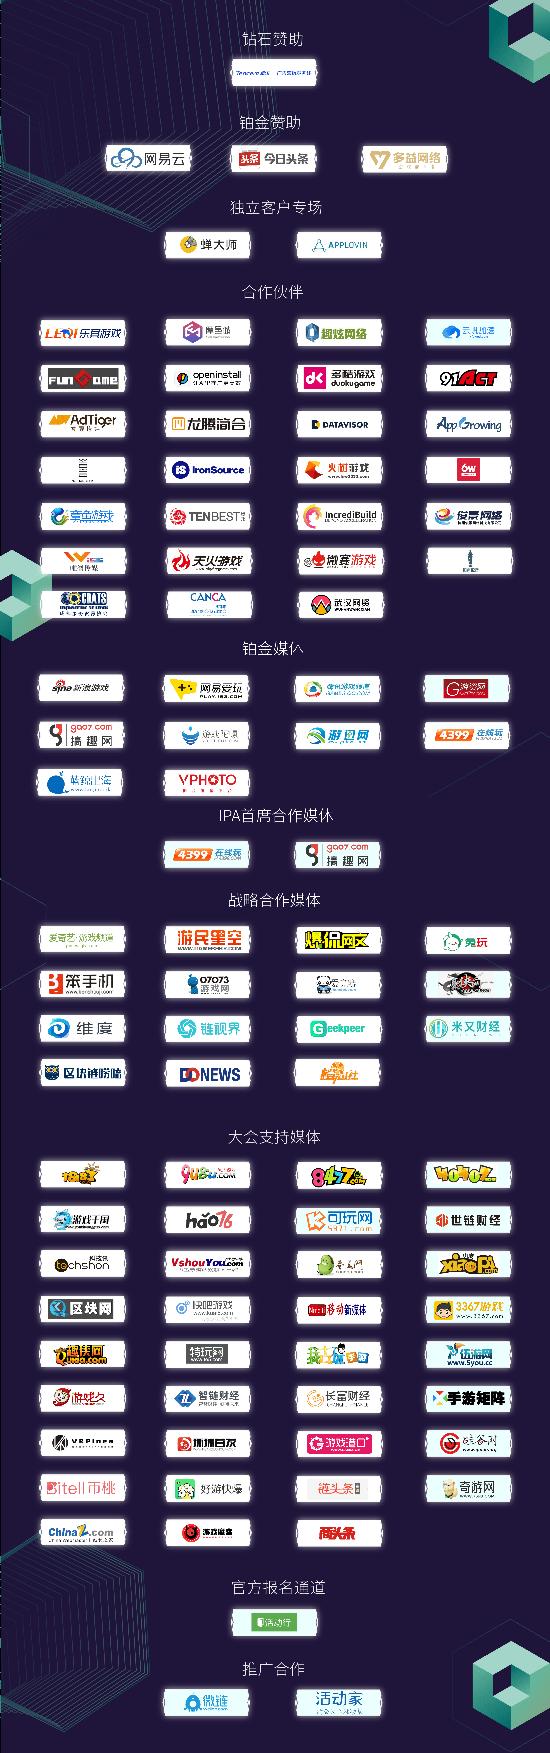 GMGC·成都·2018 Google Play赵伊江:东南亚核心打法 不要只顾买量 要多渠道整合